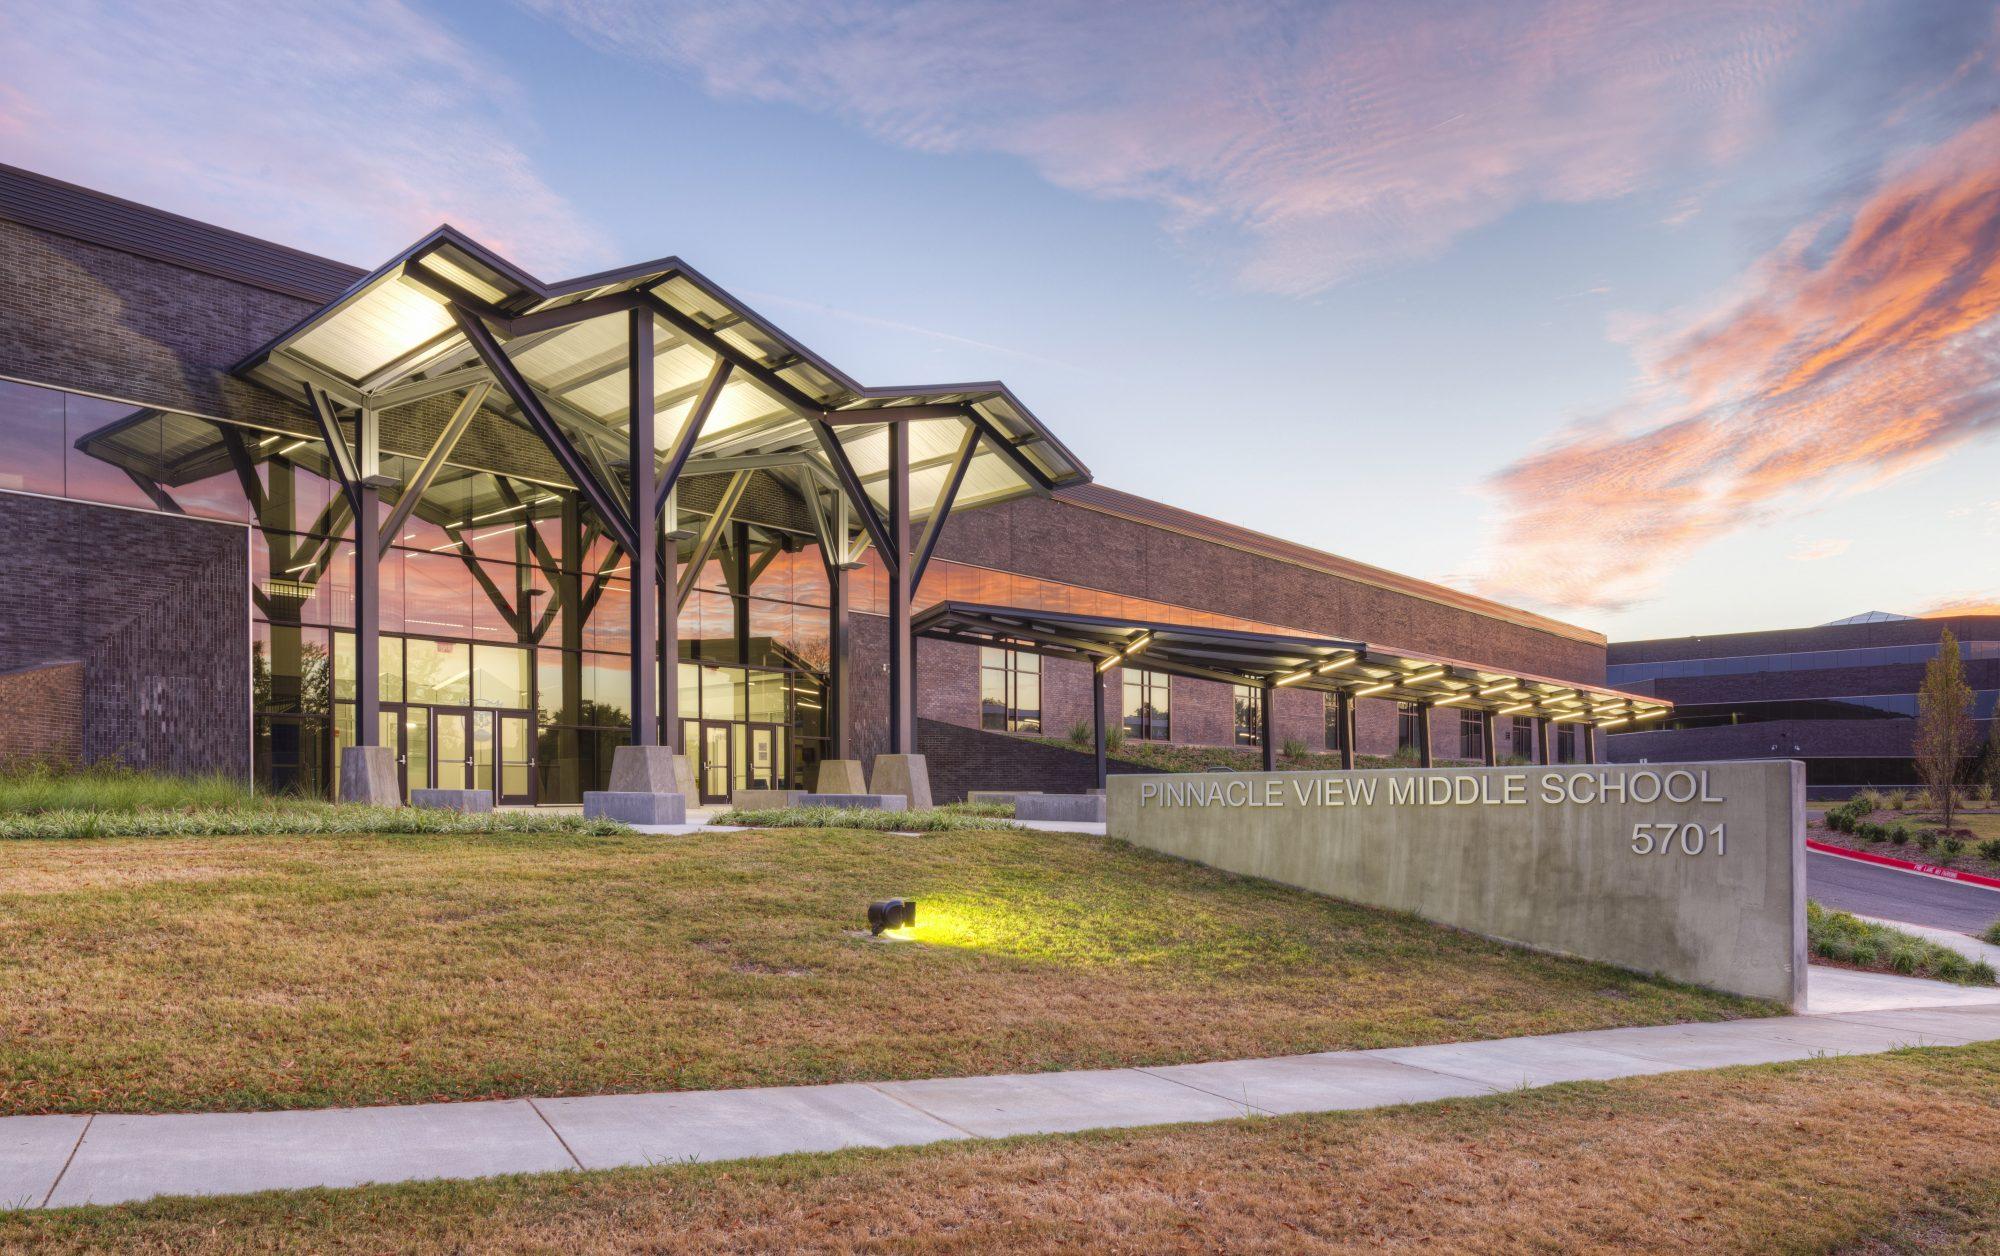 Pinnacle View Middle School – Little Rock School District